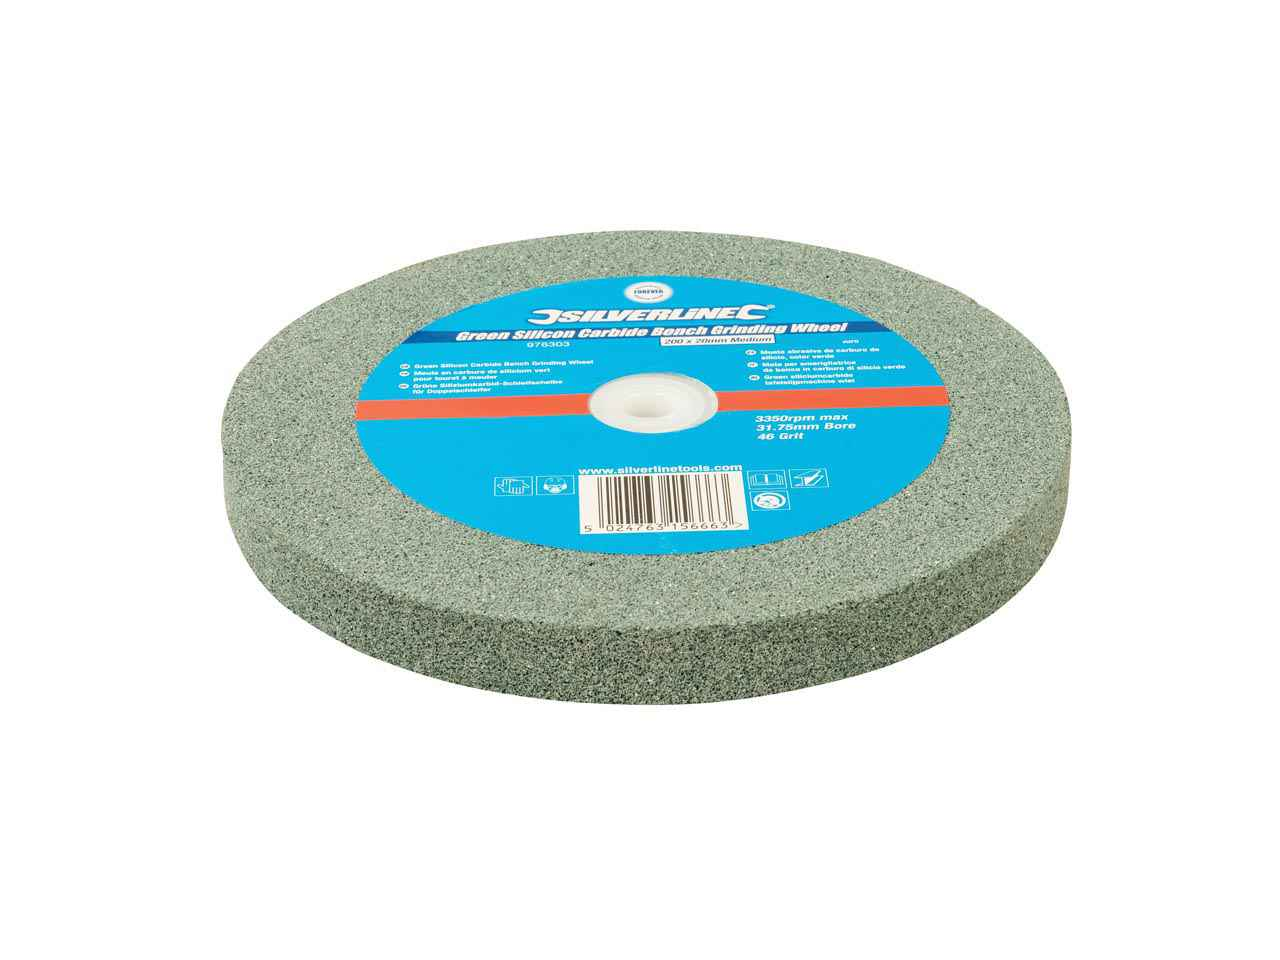 Silverline 976303 Green Silicon Carbide Bench Grinding